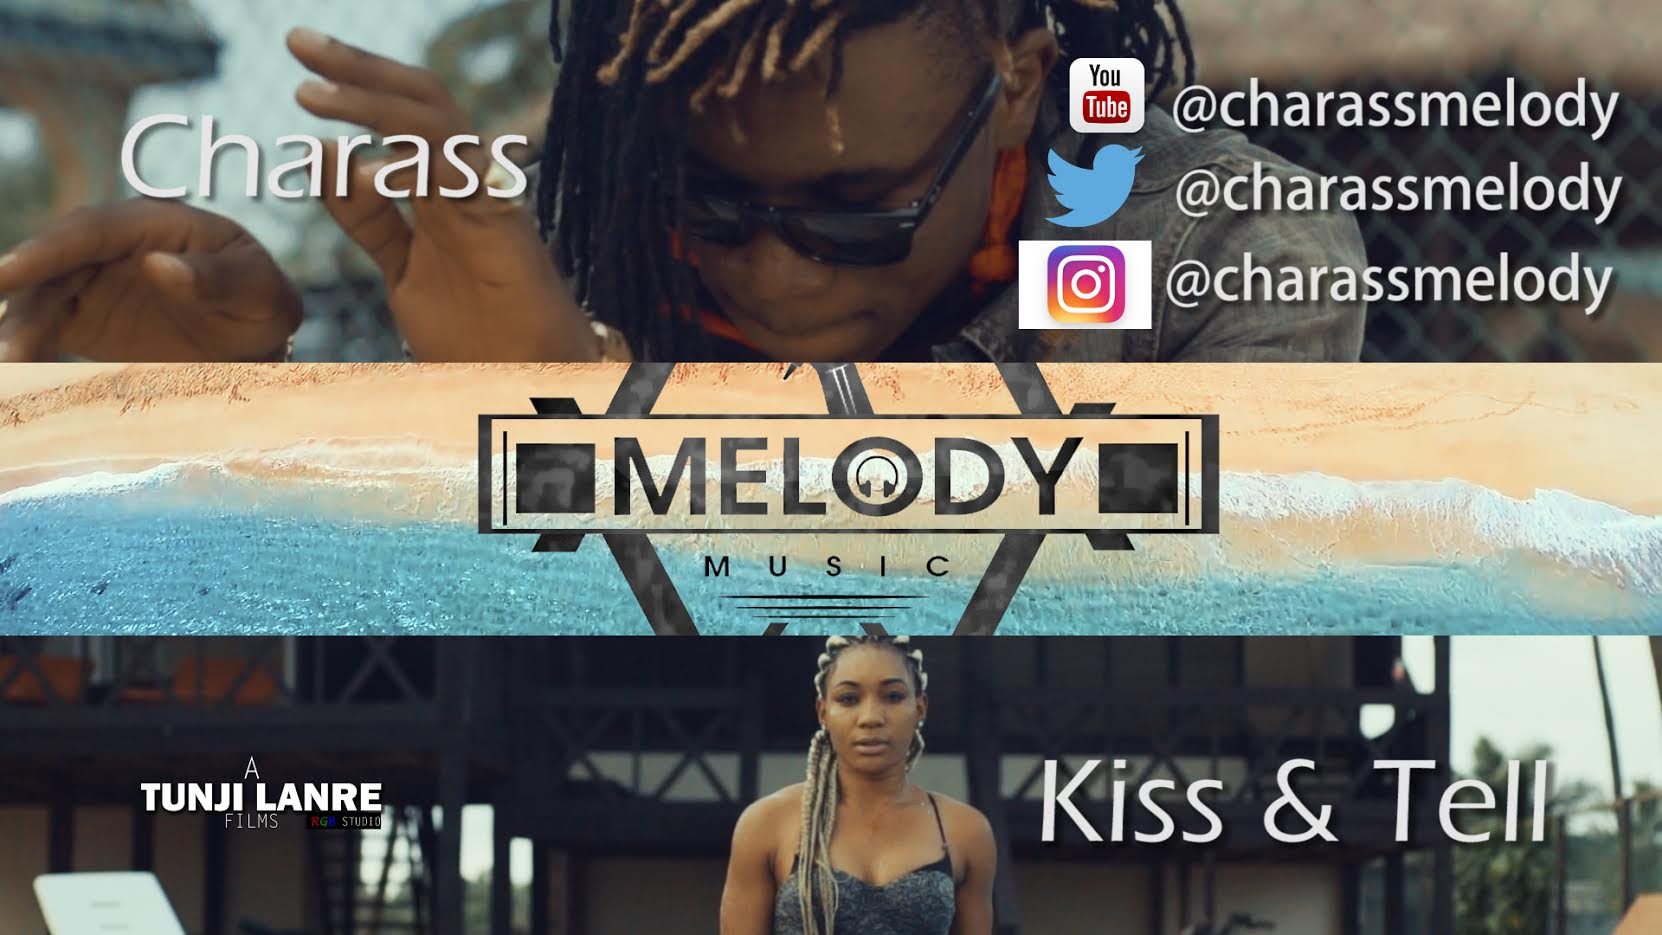 Charass Kiss & Tell video